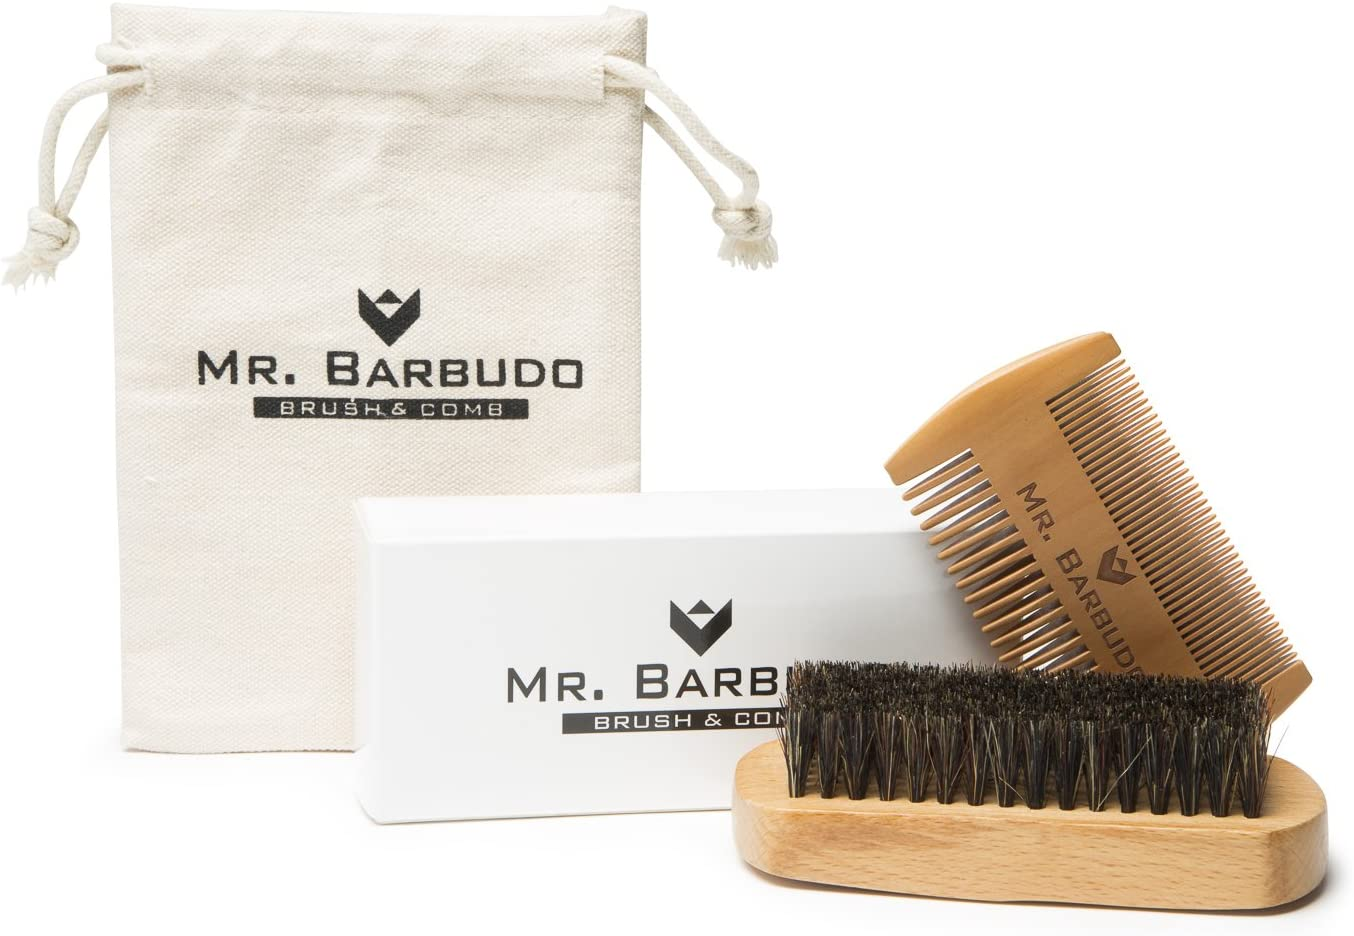 Mr. Barbudo Cepillo Para Barba Cerdas de Jabalí y Peine a Juego Con Bolsa Estuche Premium